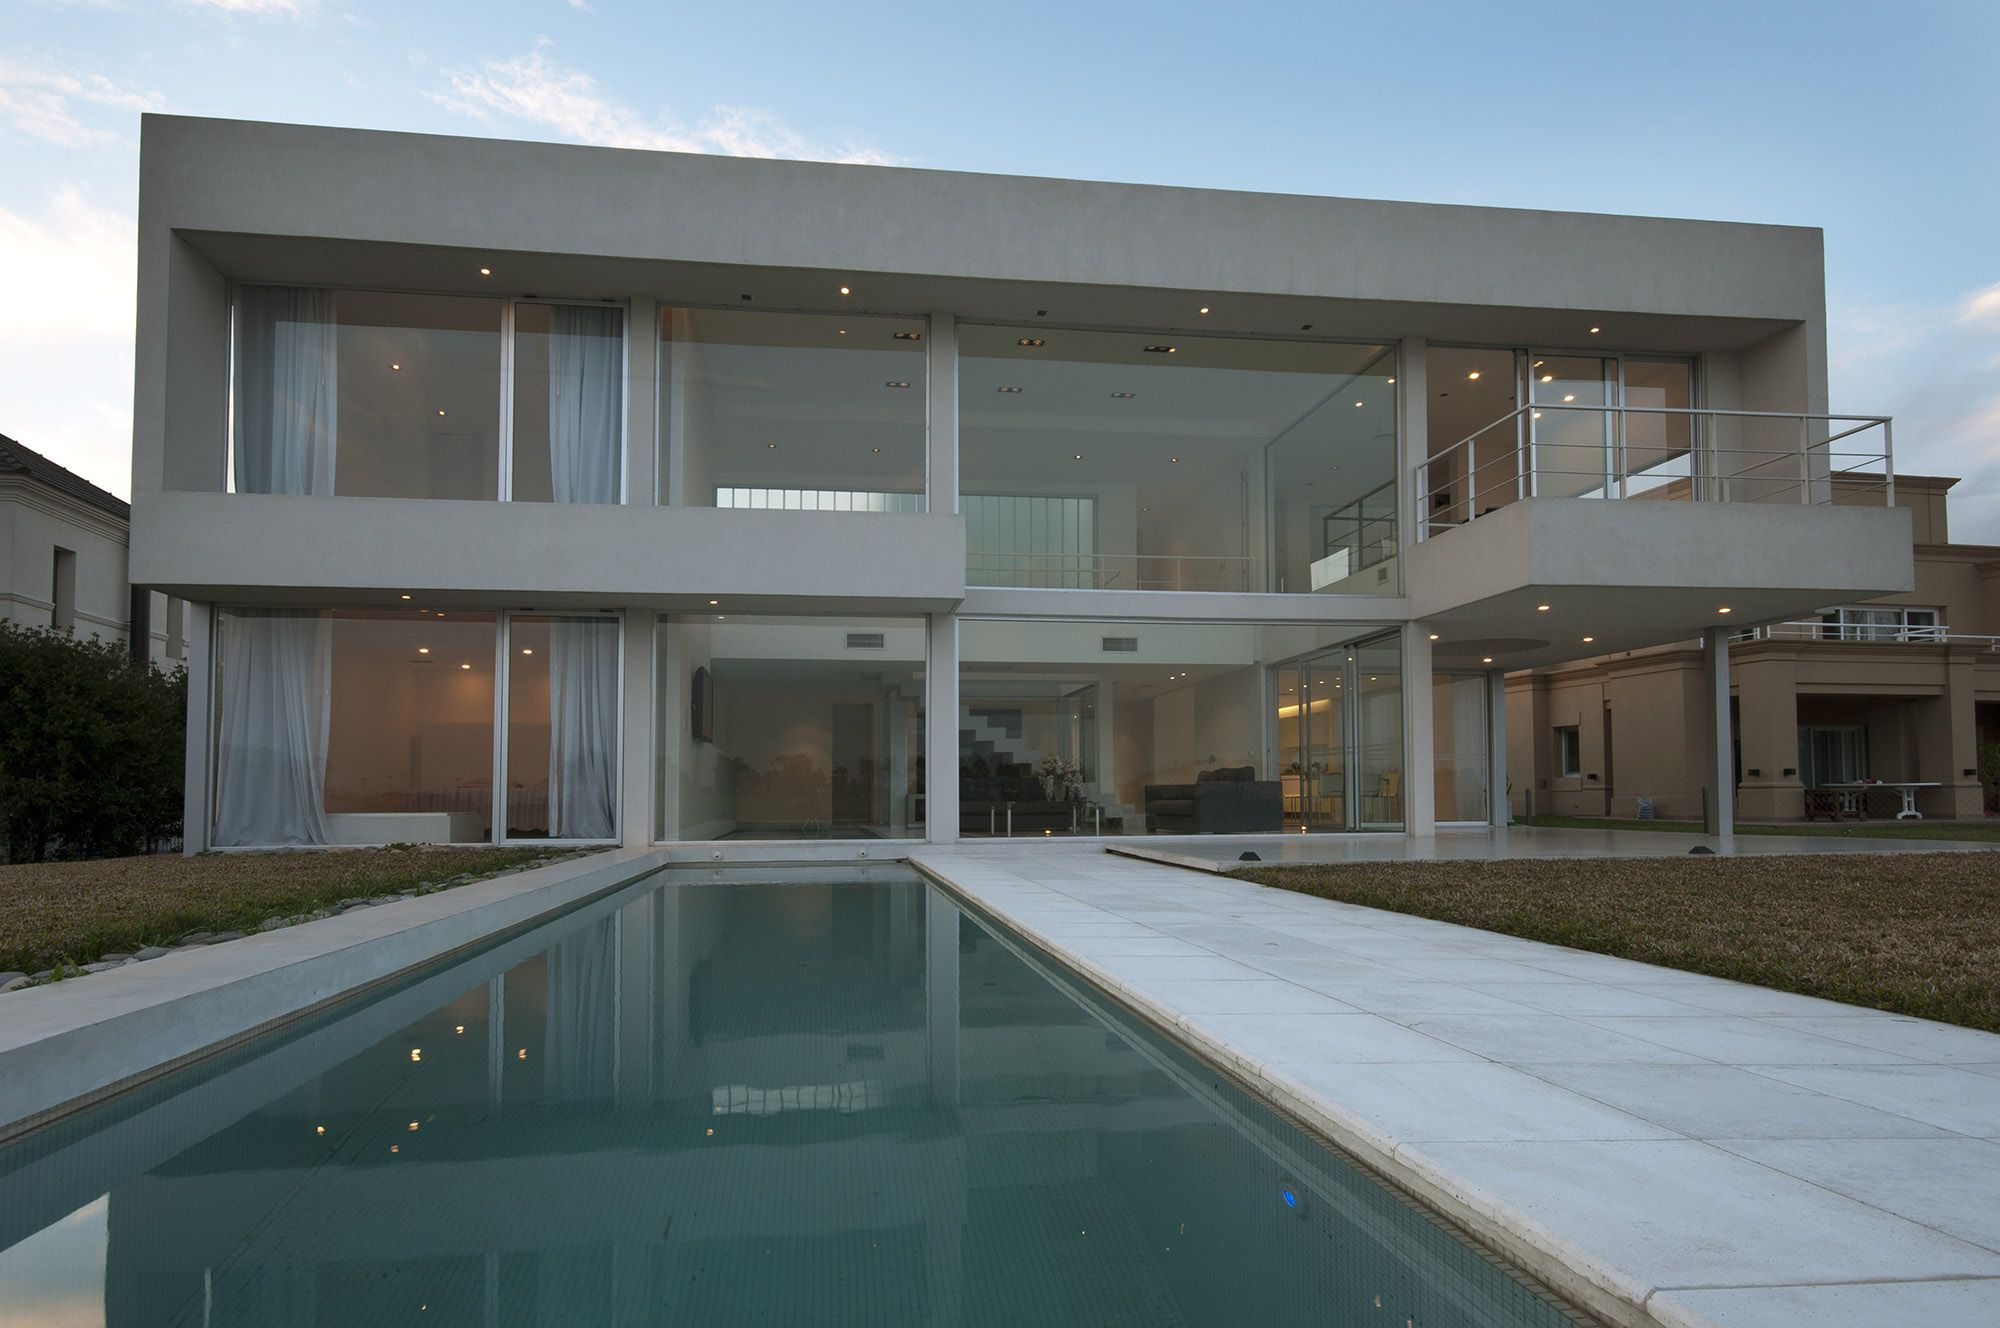 Pool House 38